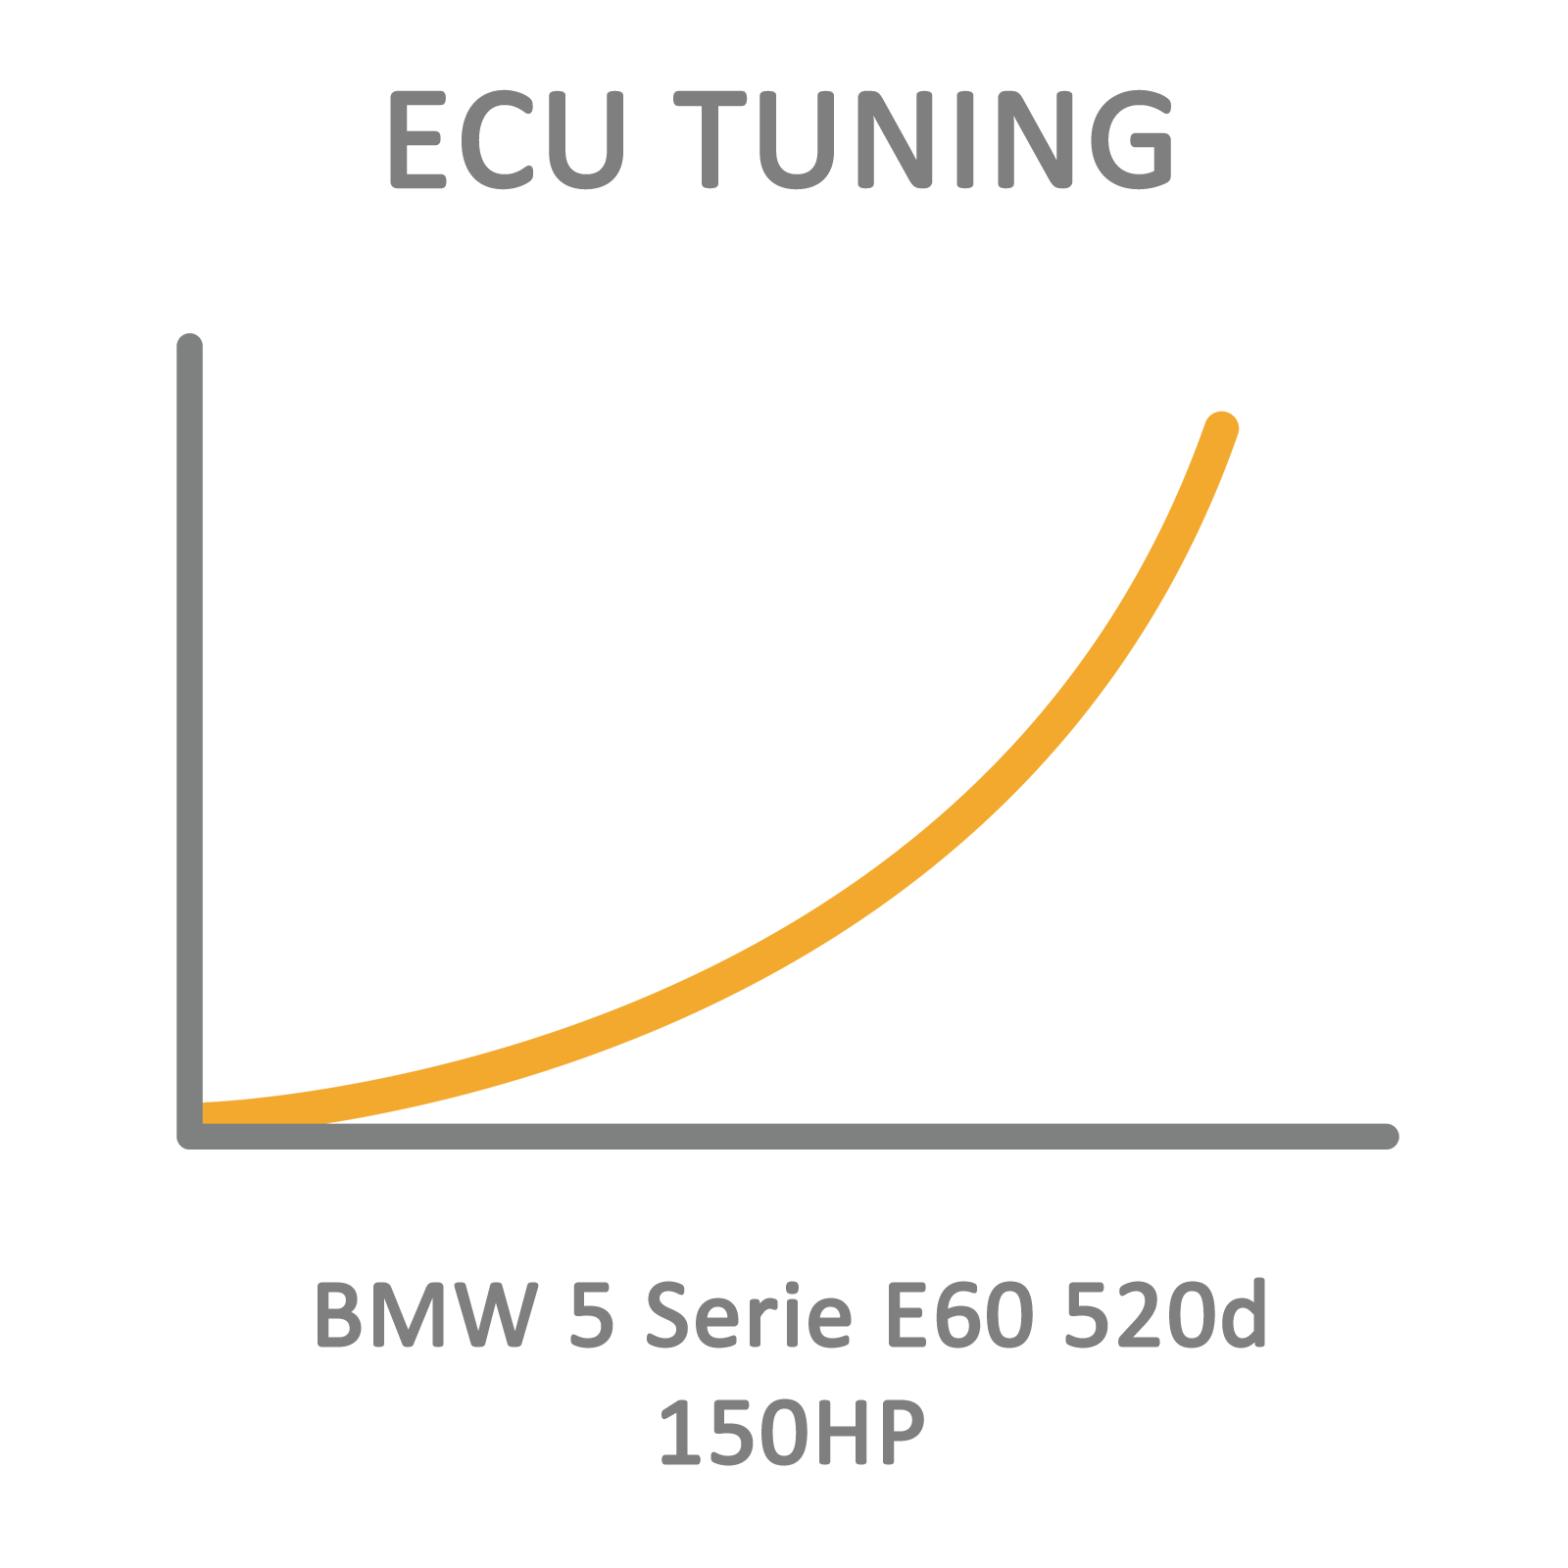 BMW 5 Series E60 520d 150HP ECU Tuning Remapping Programming